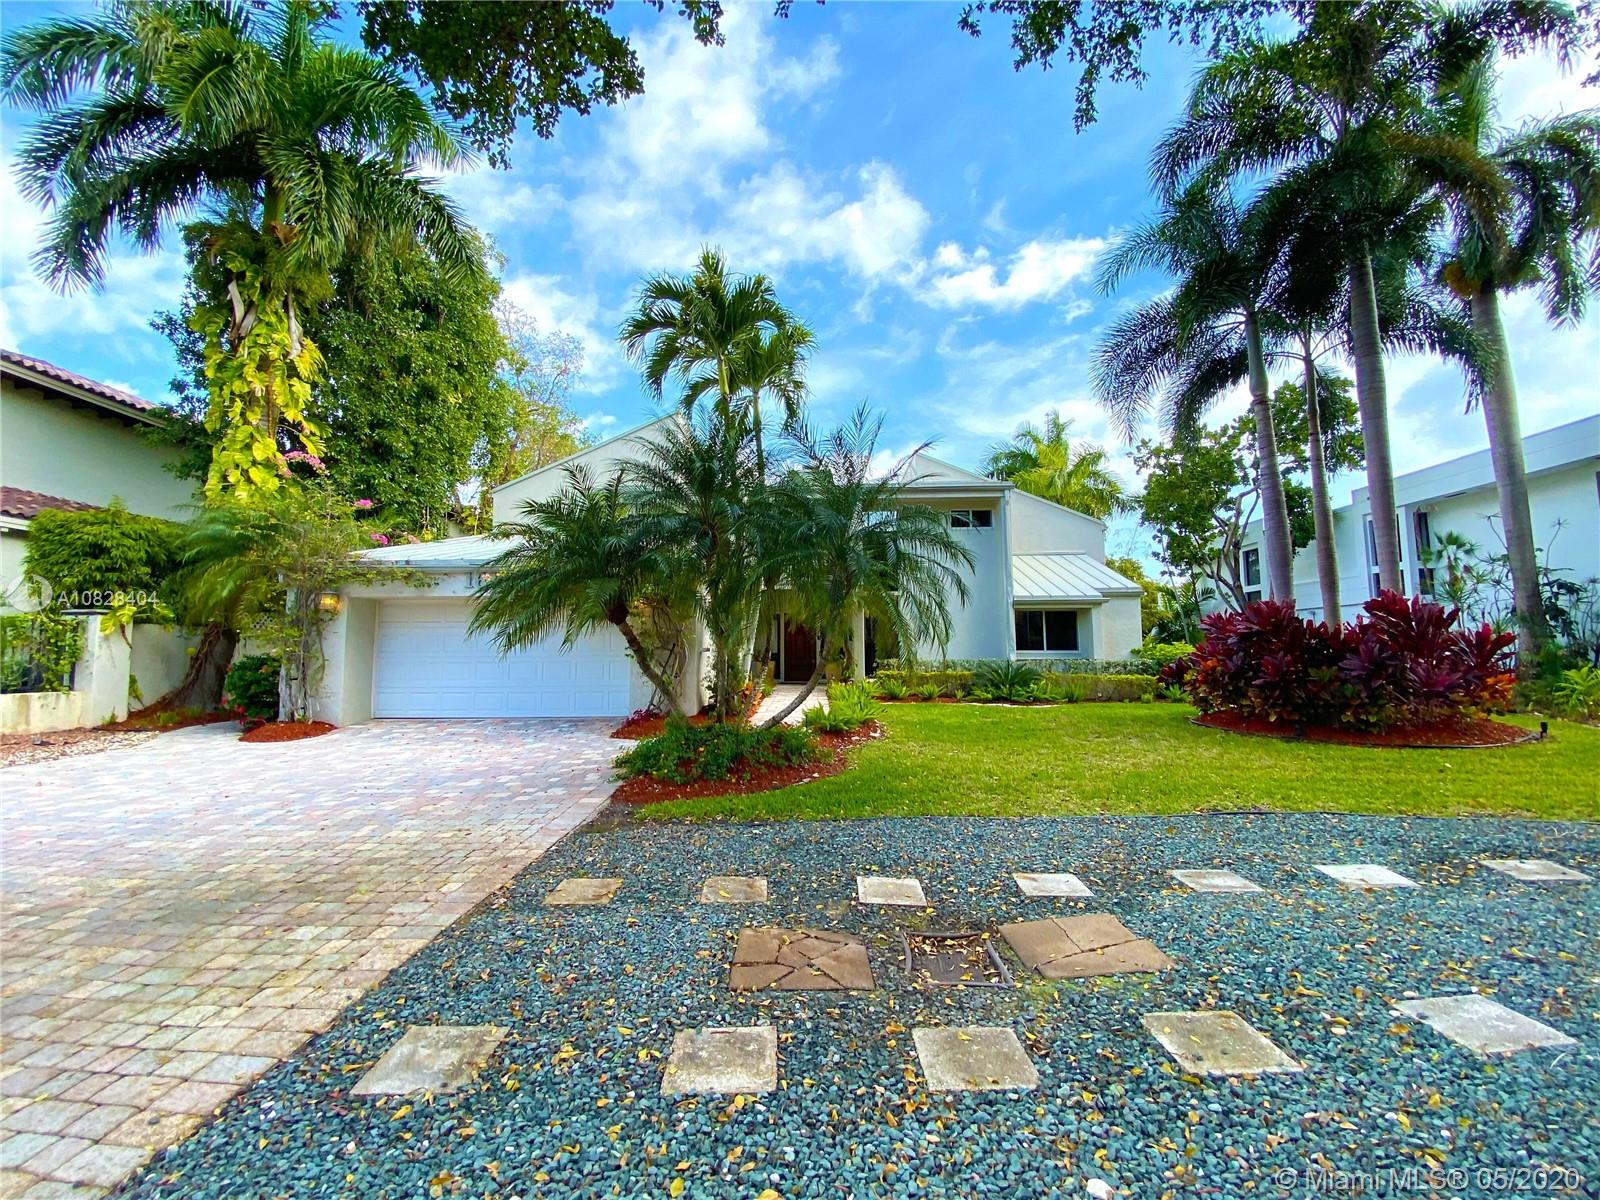 1611 SE 8th St, Fort Lauderdale, FL 33316